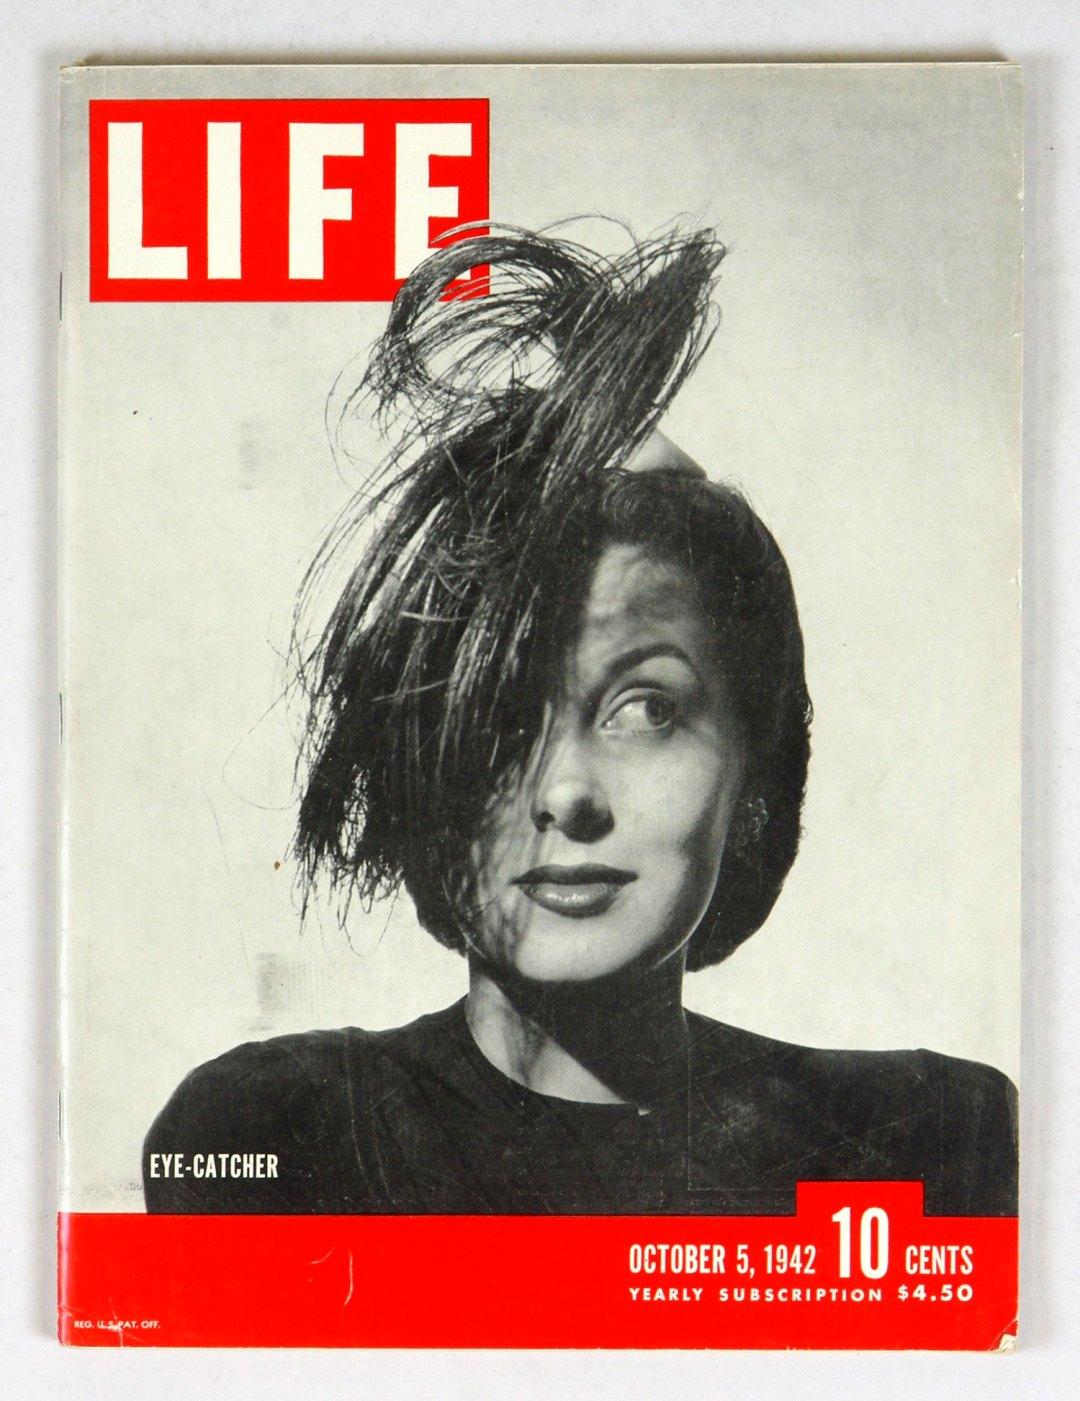 LIFE Magazine 1942 October 5 Eye Catcher Chief